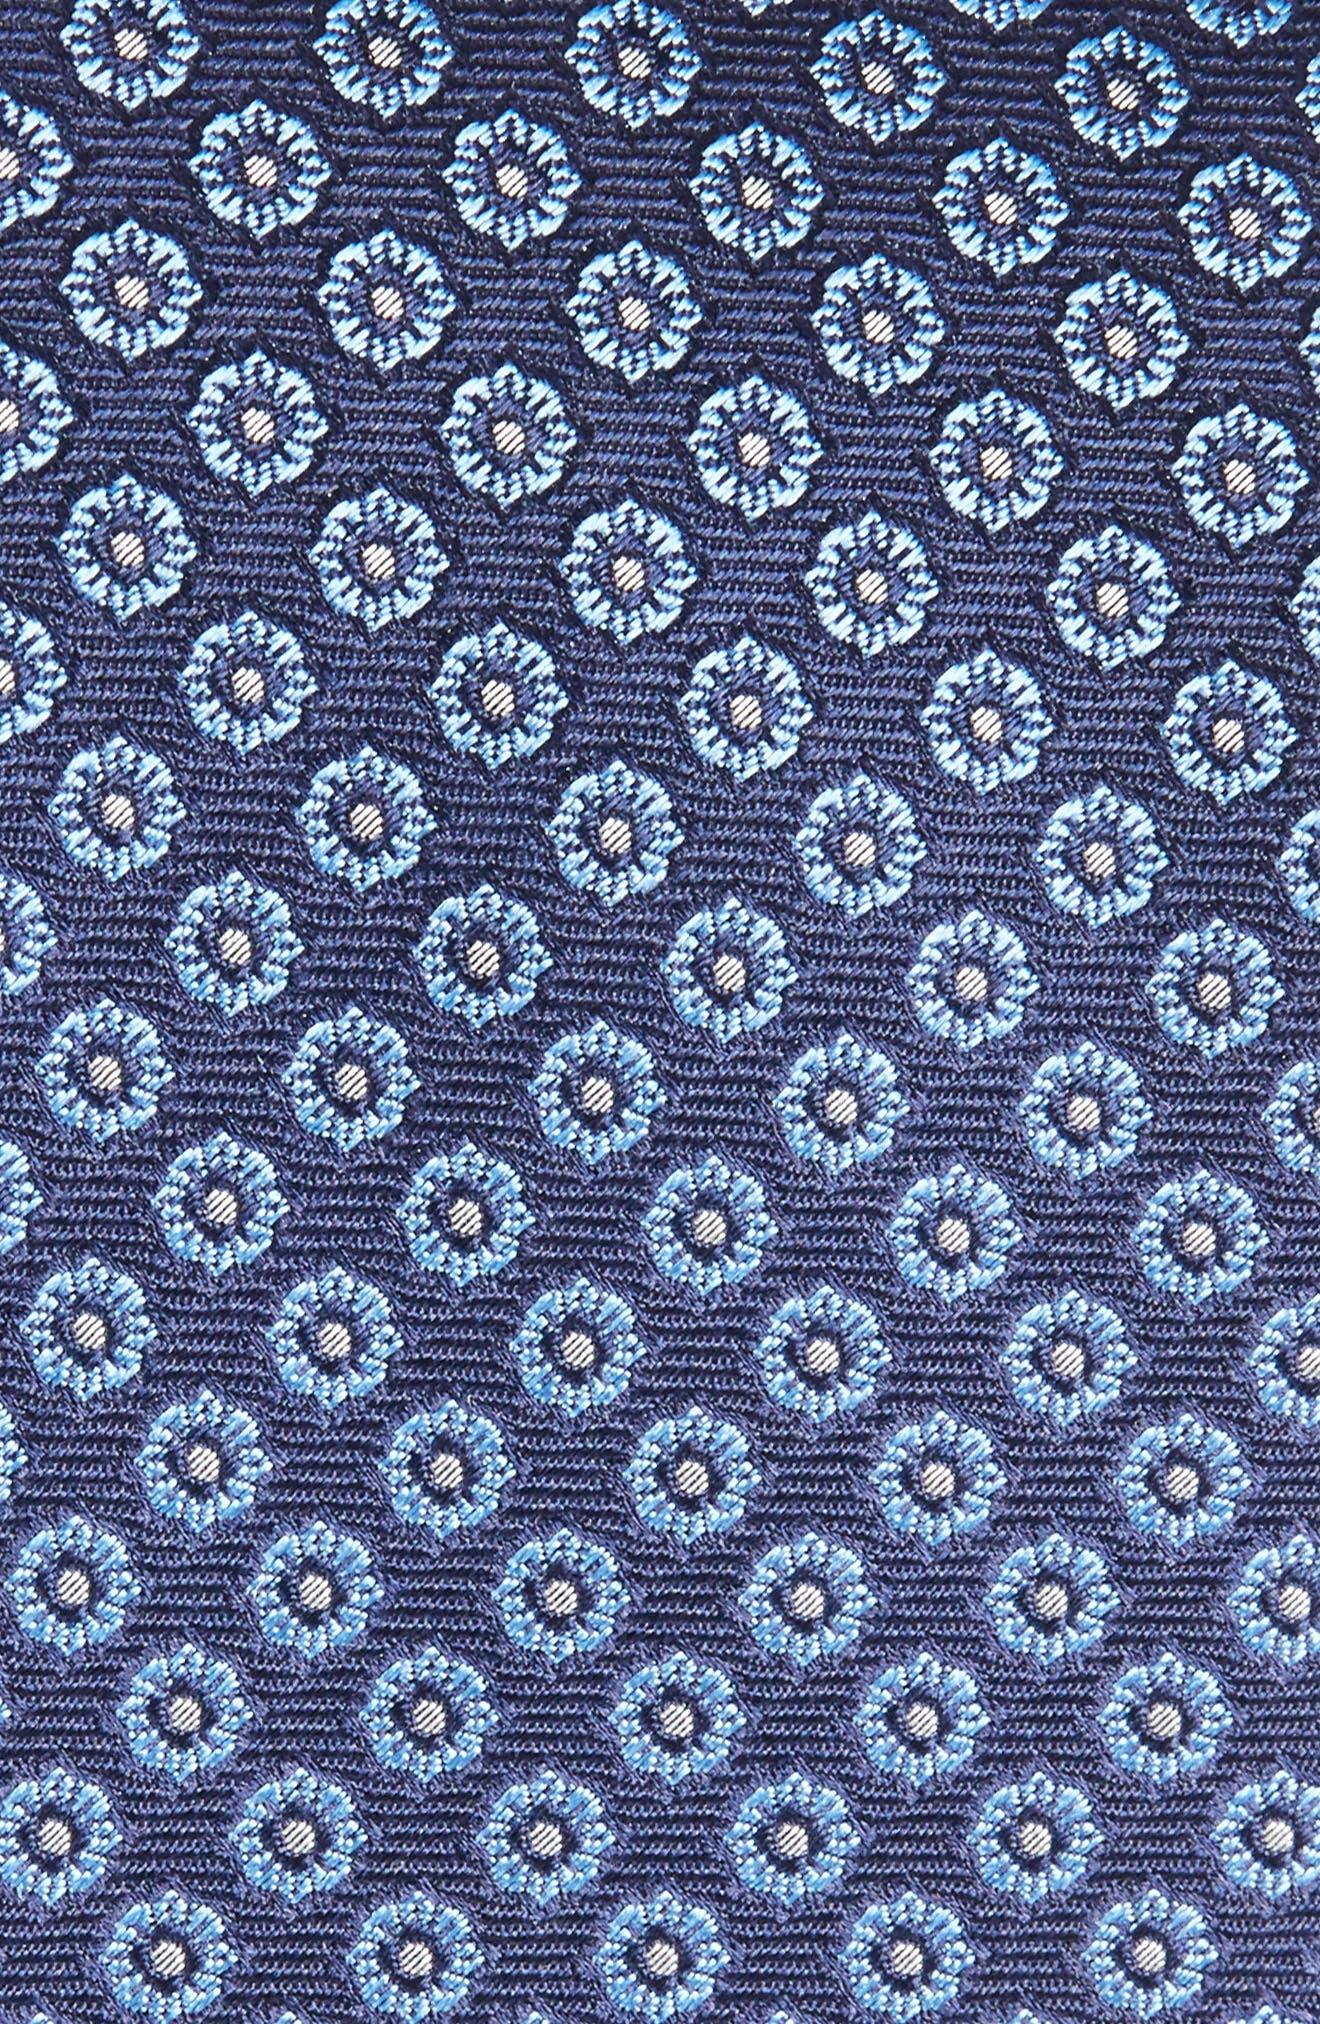 Floral Medallion Silk Tie,                             Alternate thumbnail 2, color,                             Navy